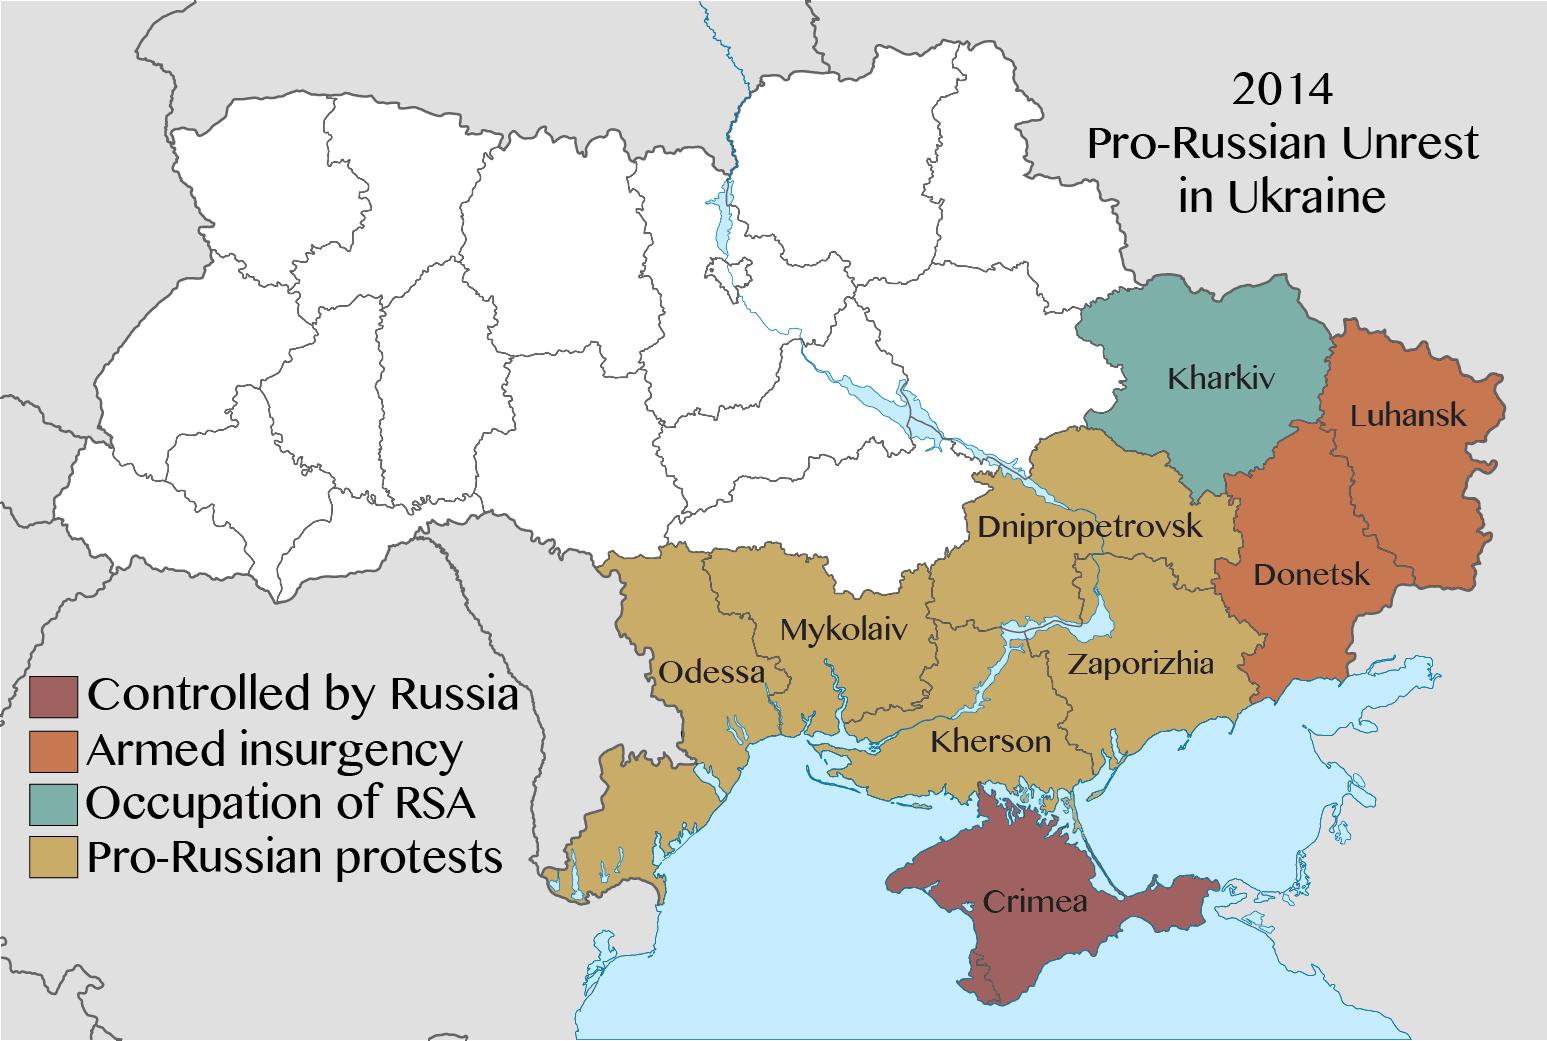 2014_pro-Russian_unrest_in_Ukraine